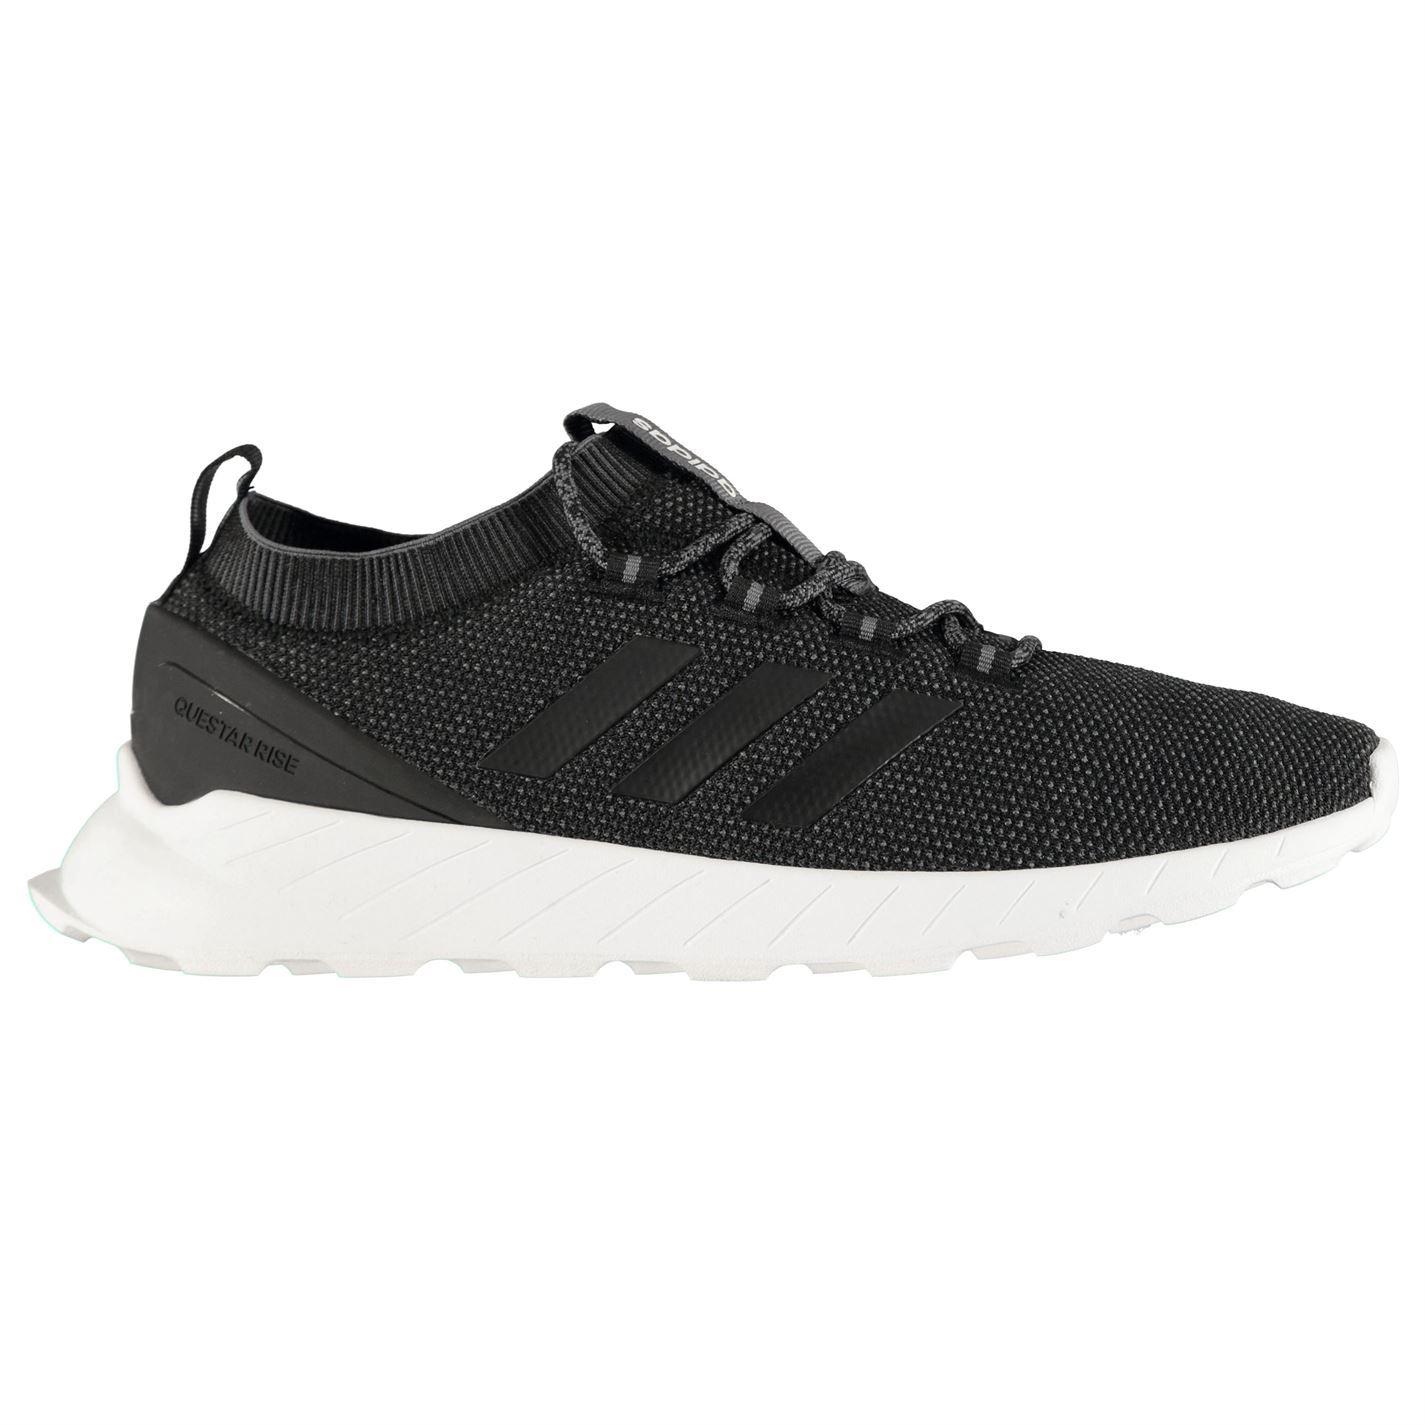 adidas ginnastica scarpe uomo